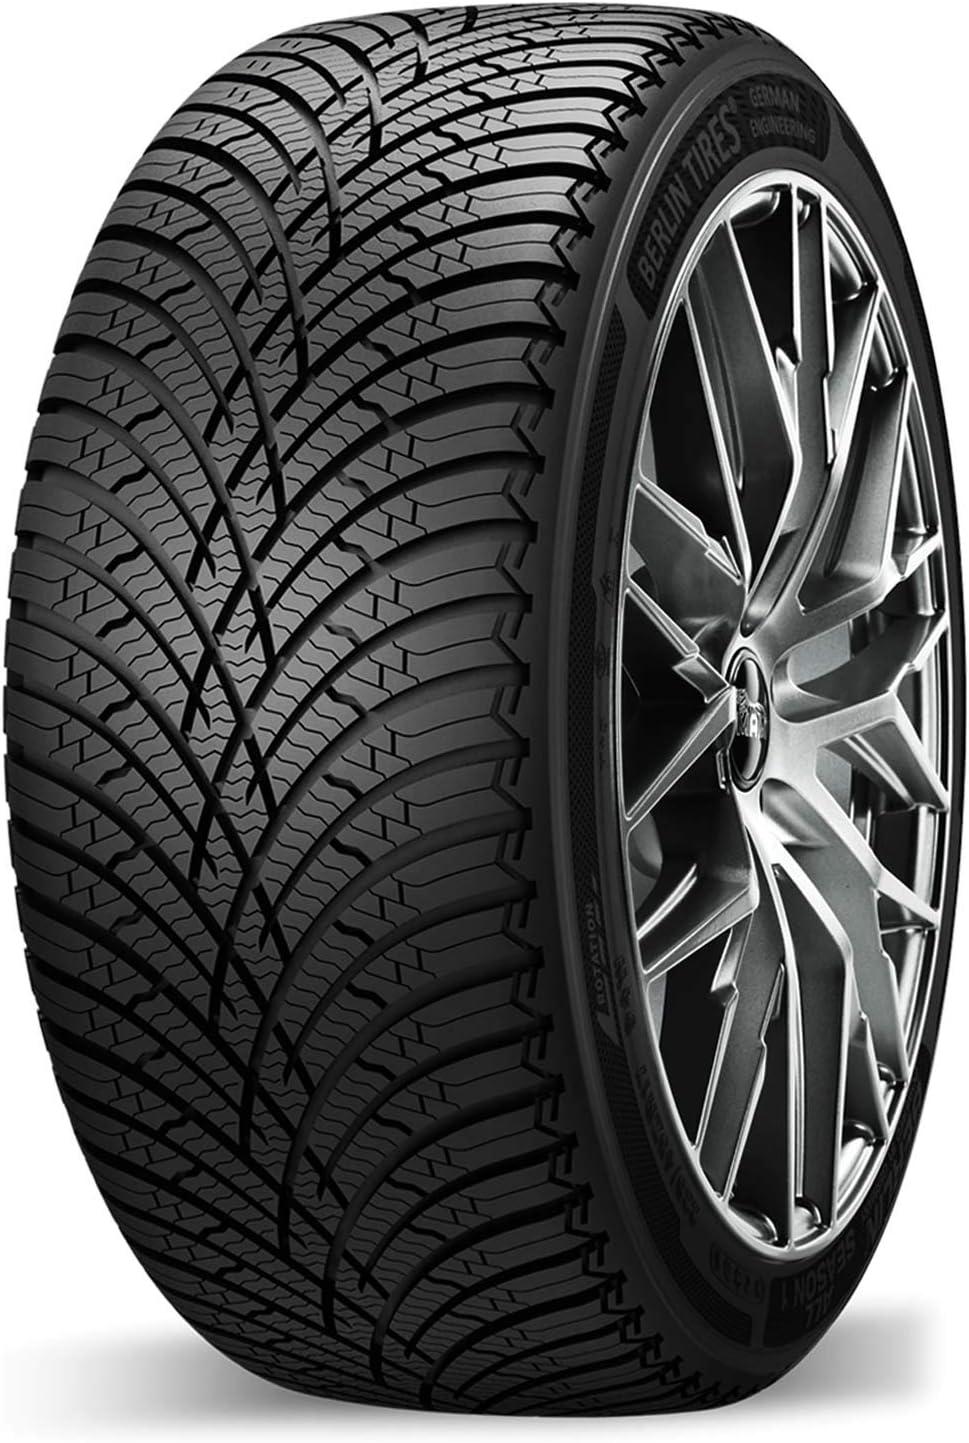 Berlin Tires All Season 1 195 60 15 88 H E B 71db Allwetter Pkw Auto